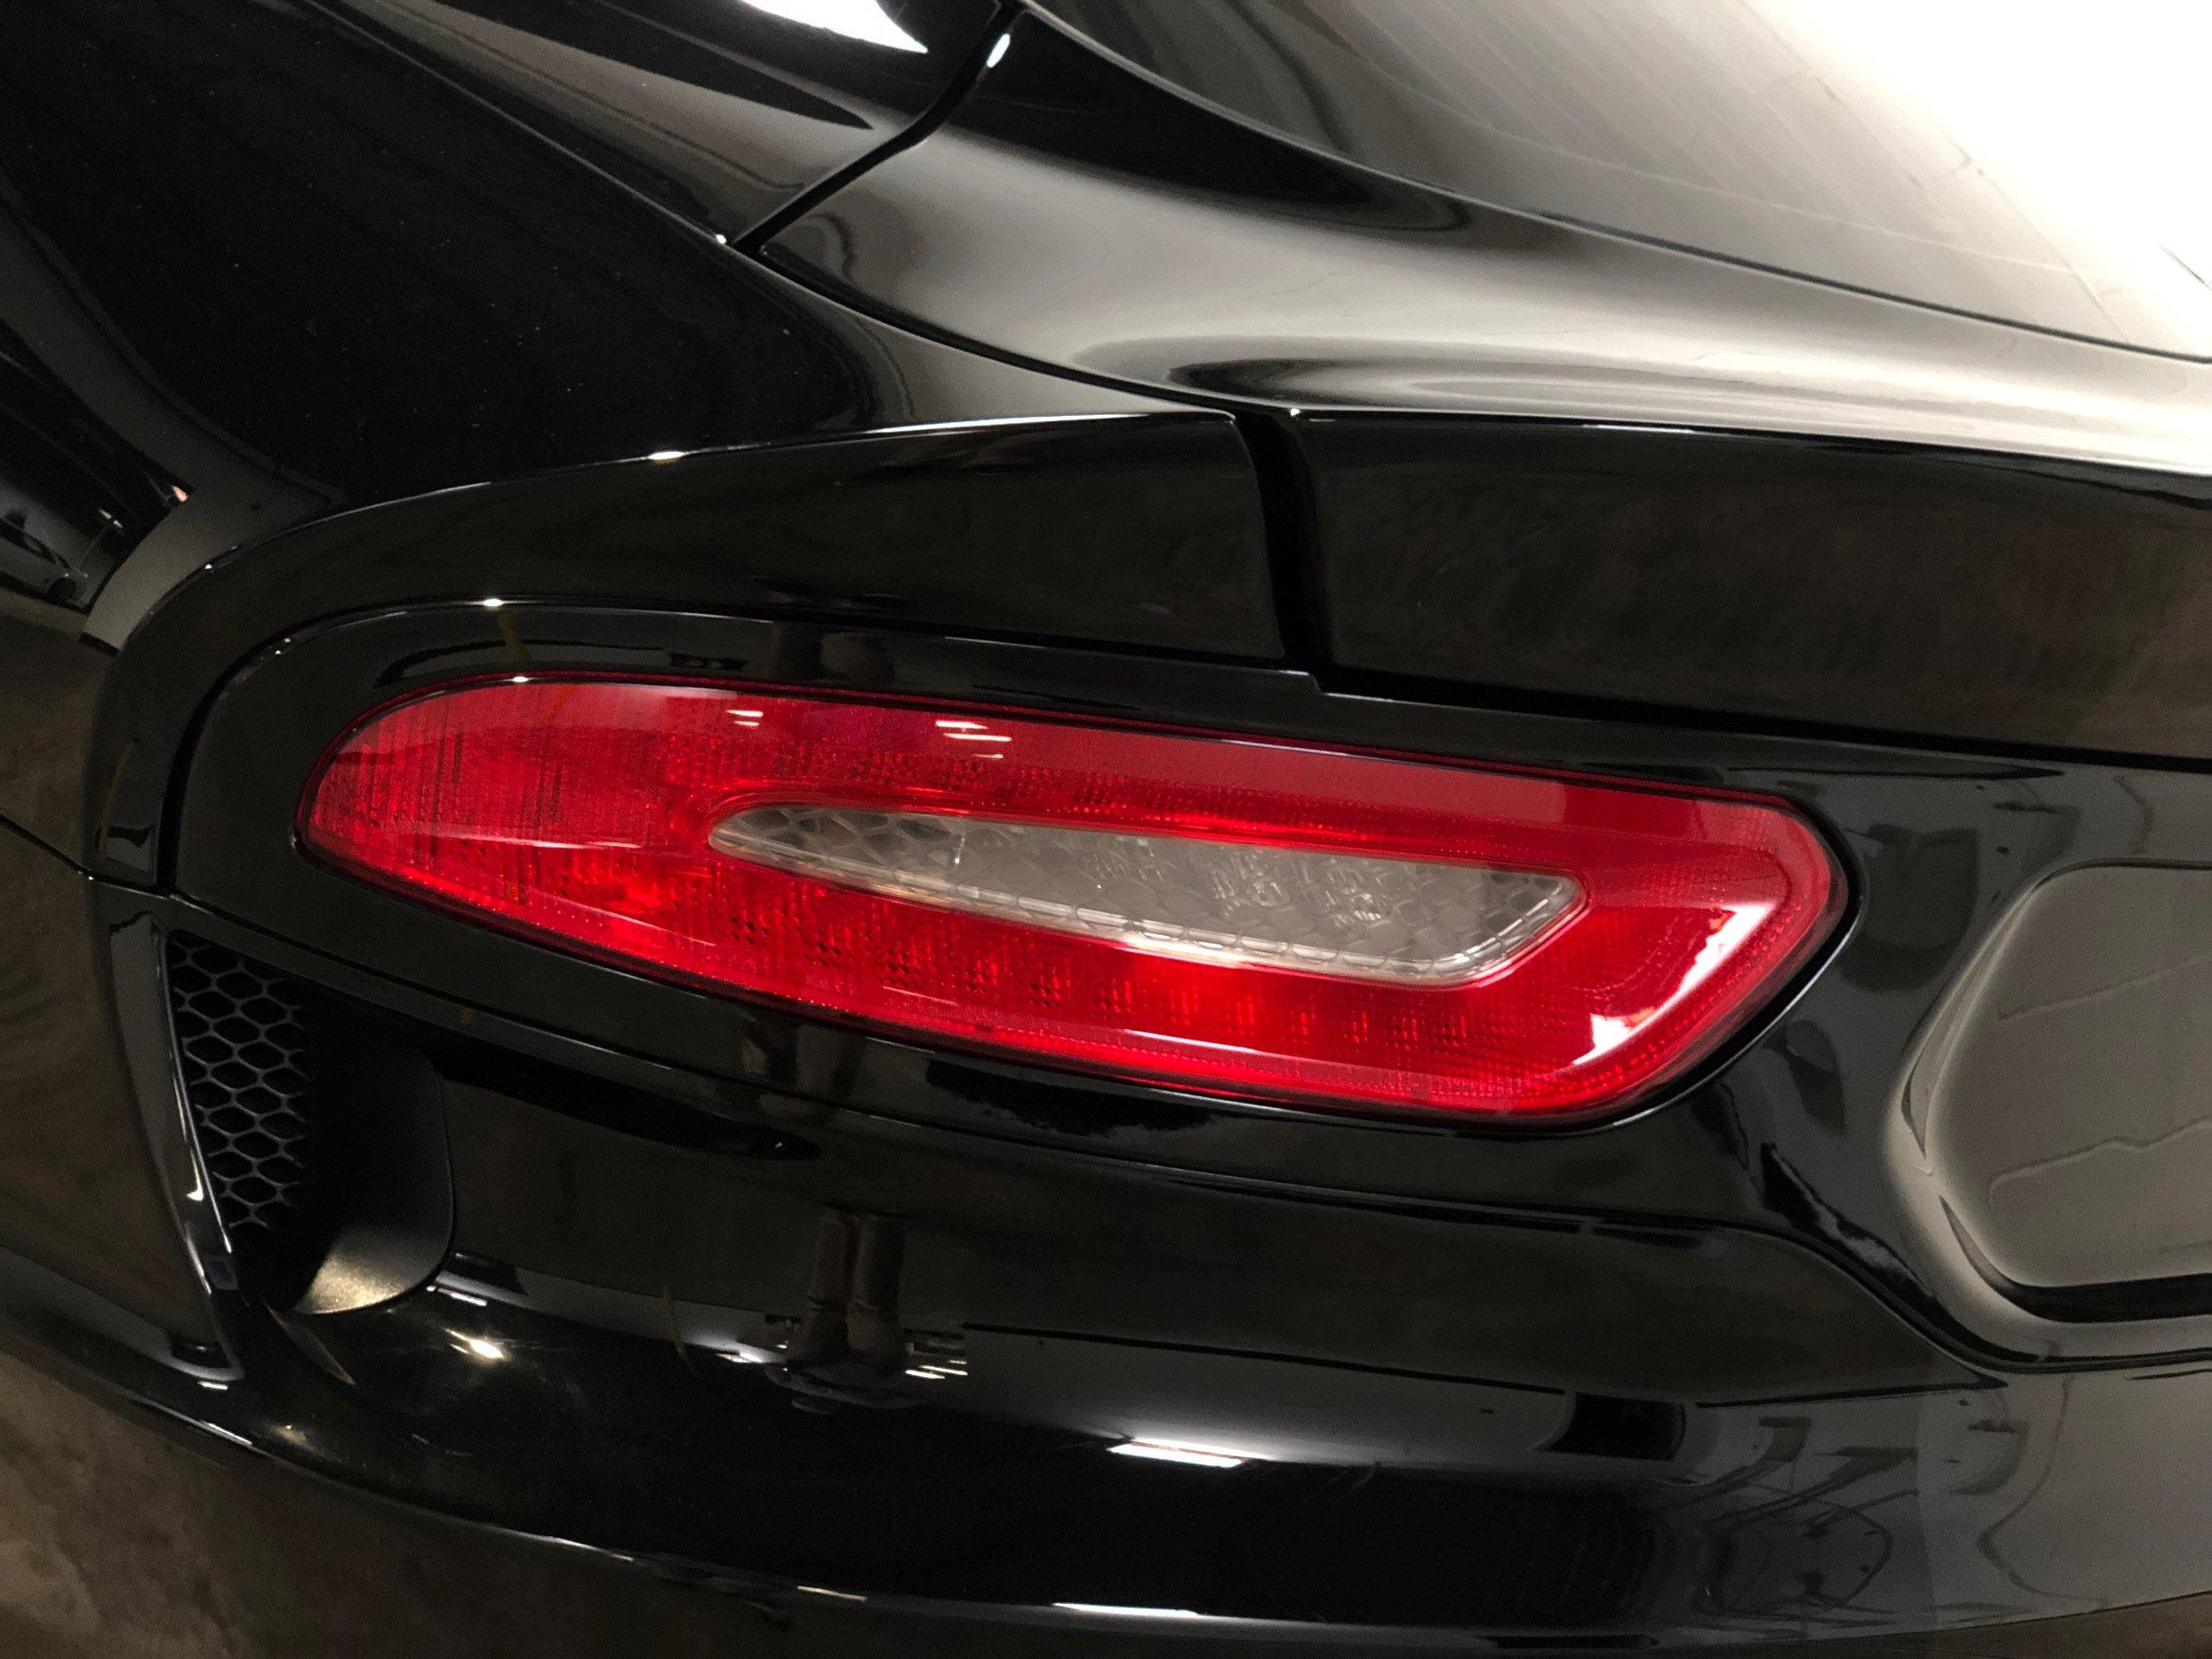 Black Dodge Viper Gts Back Light